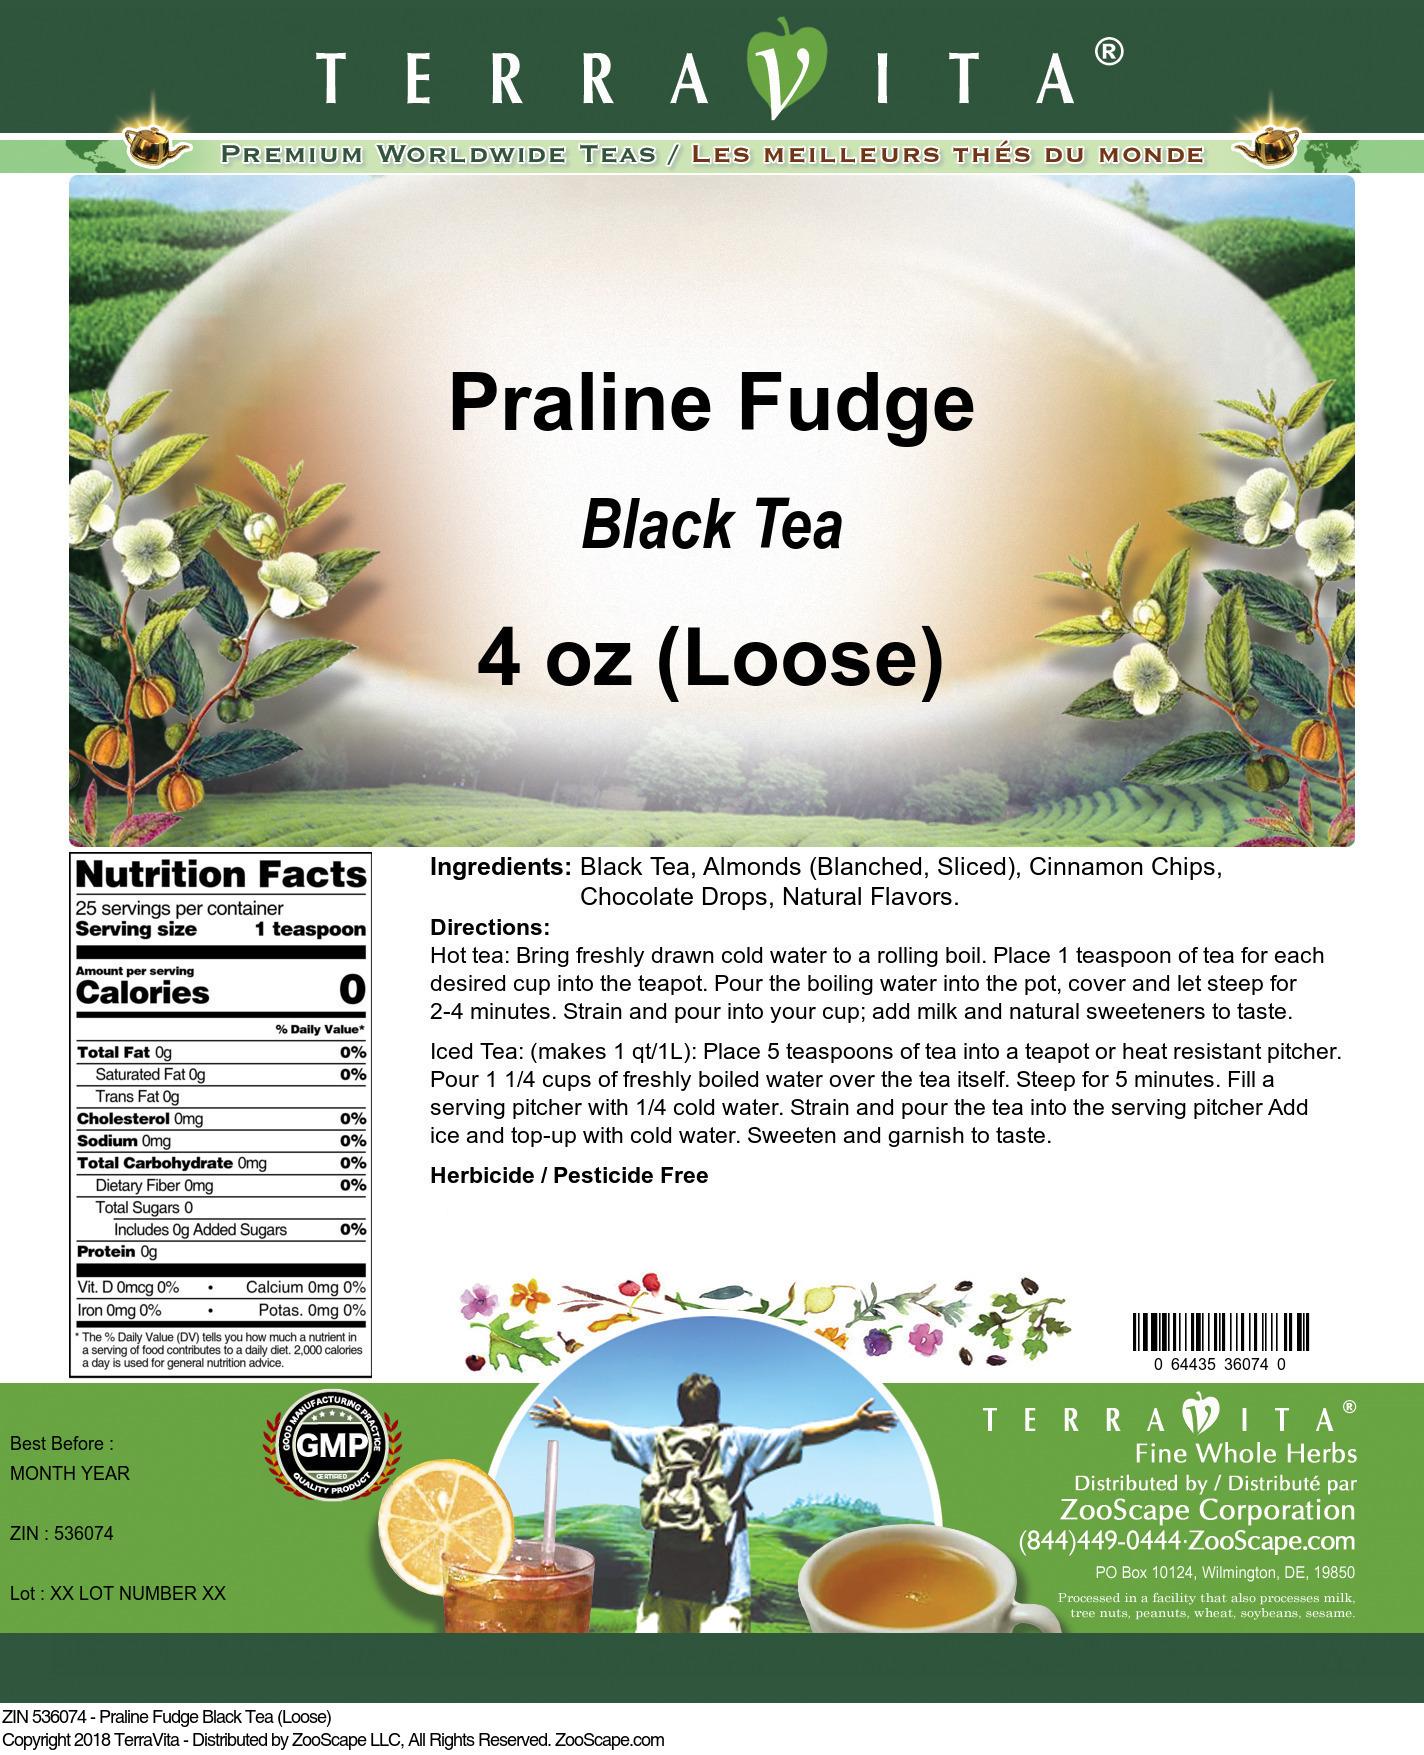 Praline Fudge Black Tea (Loose)